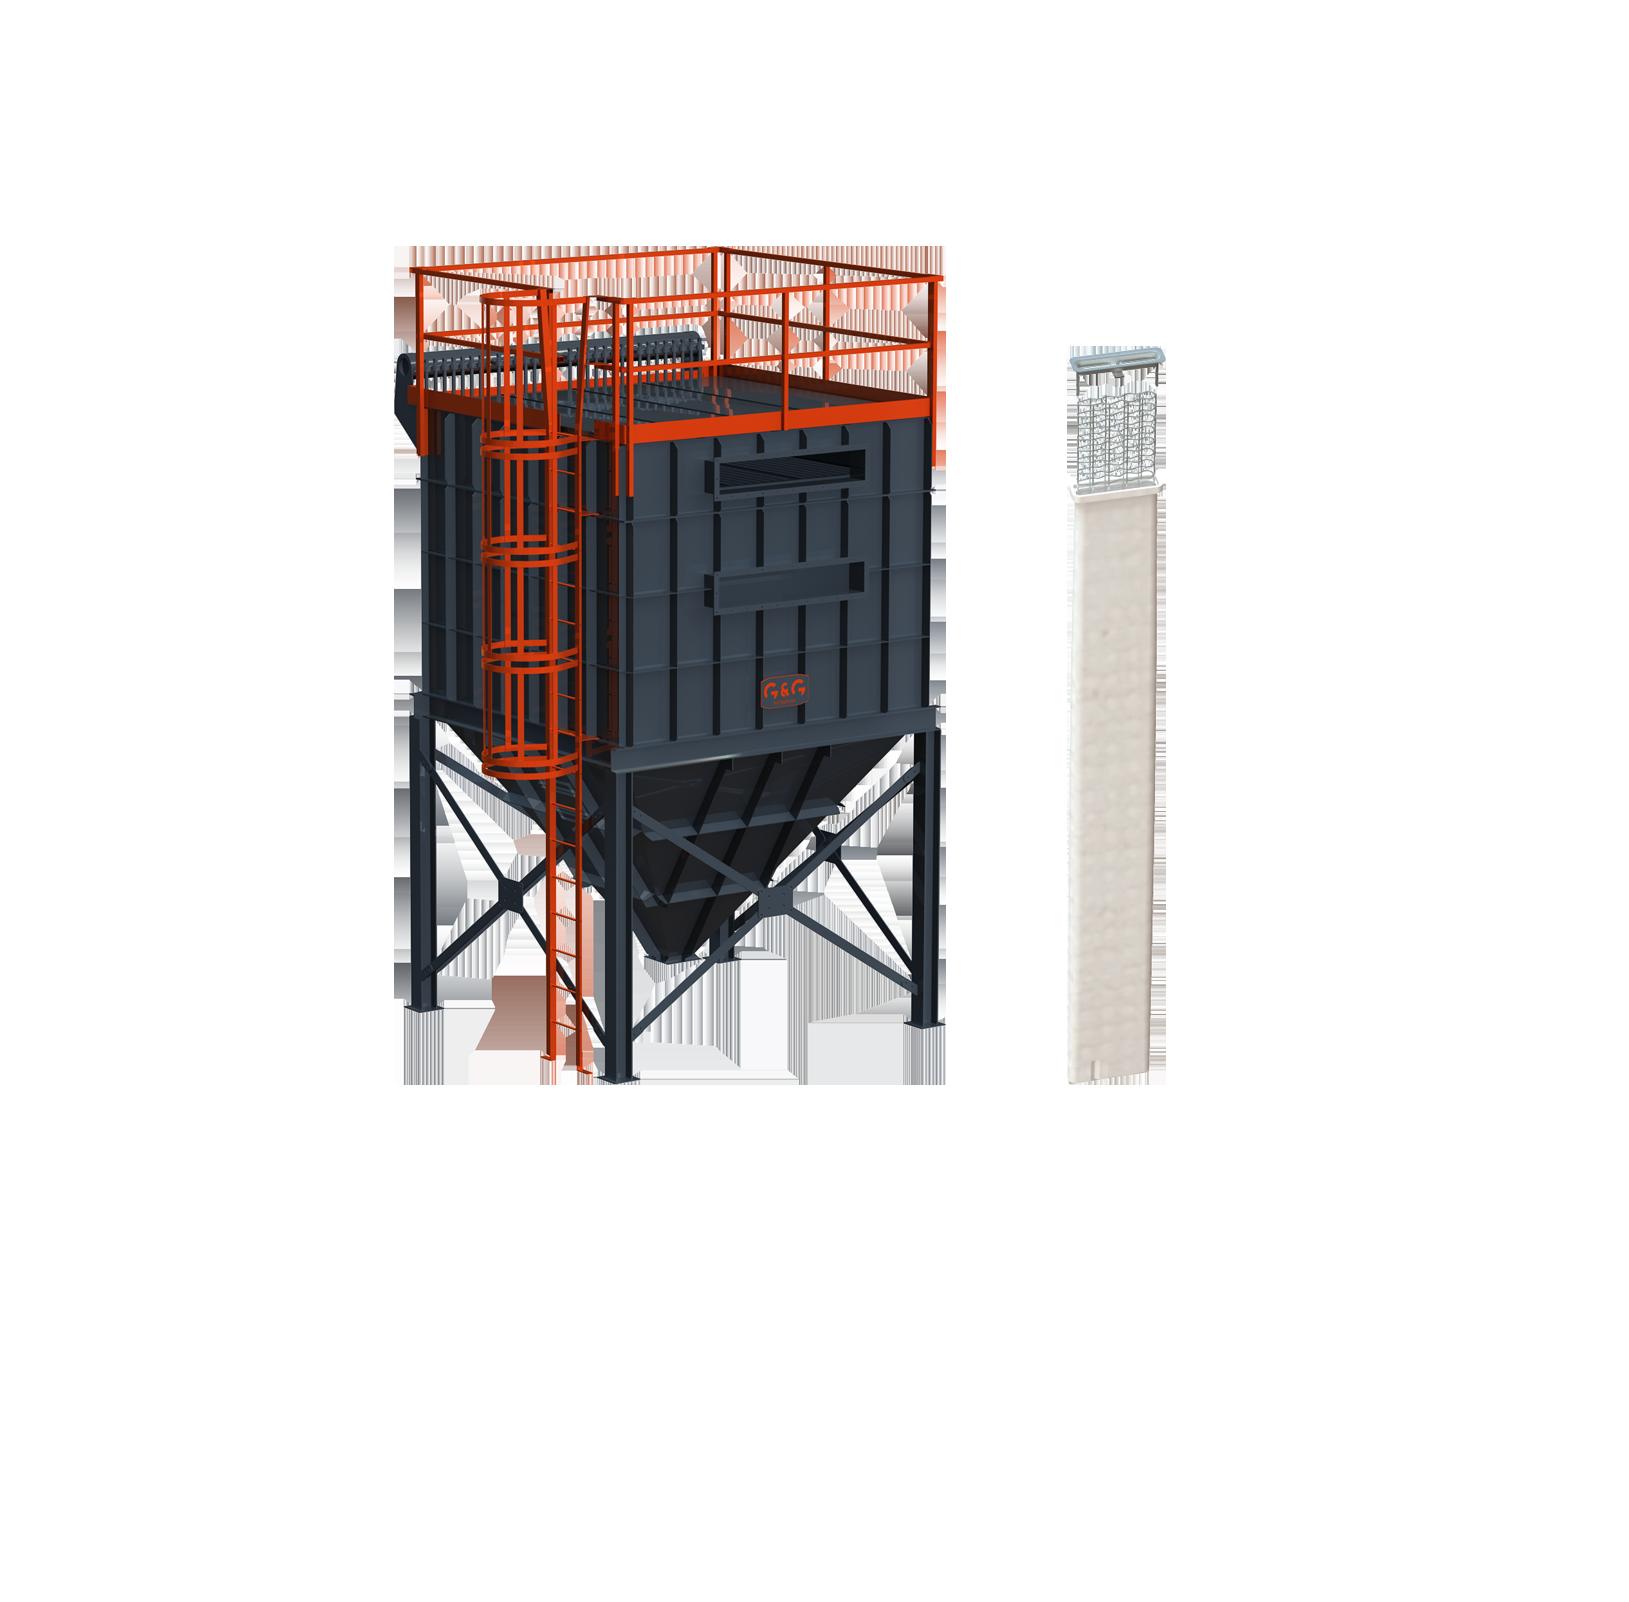 Los filtros de manga plana